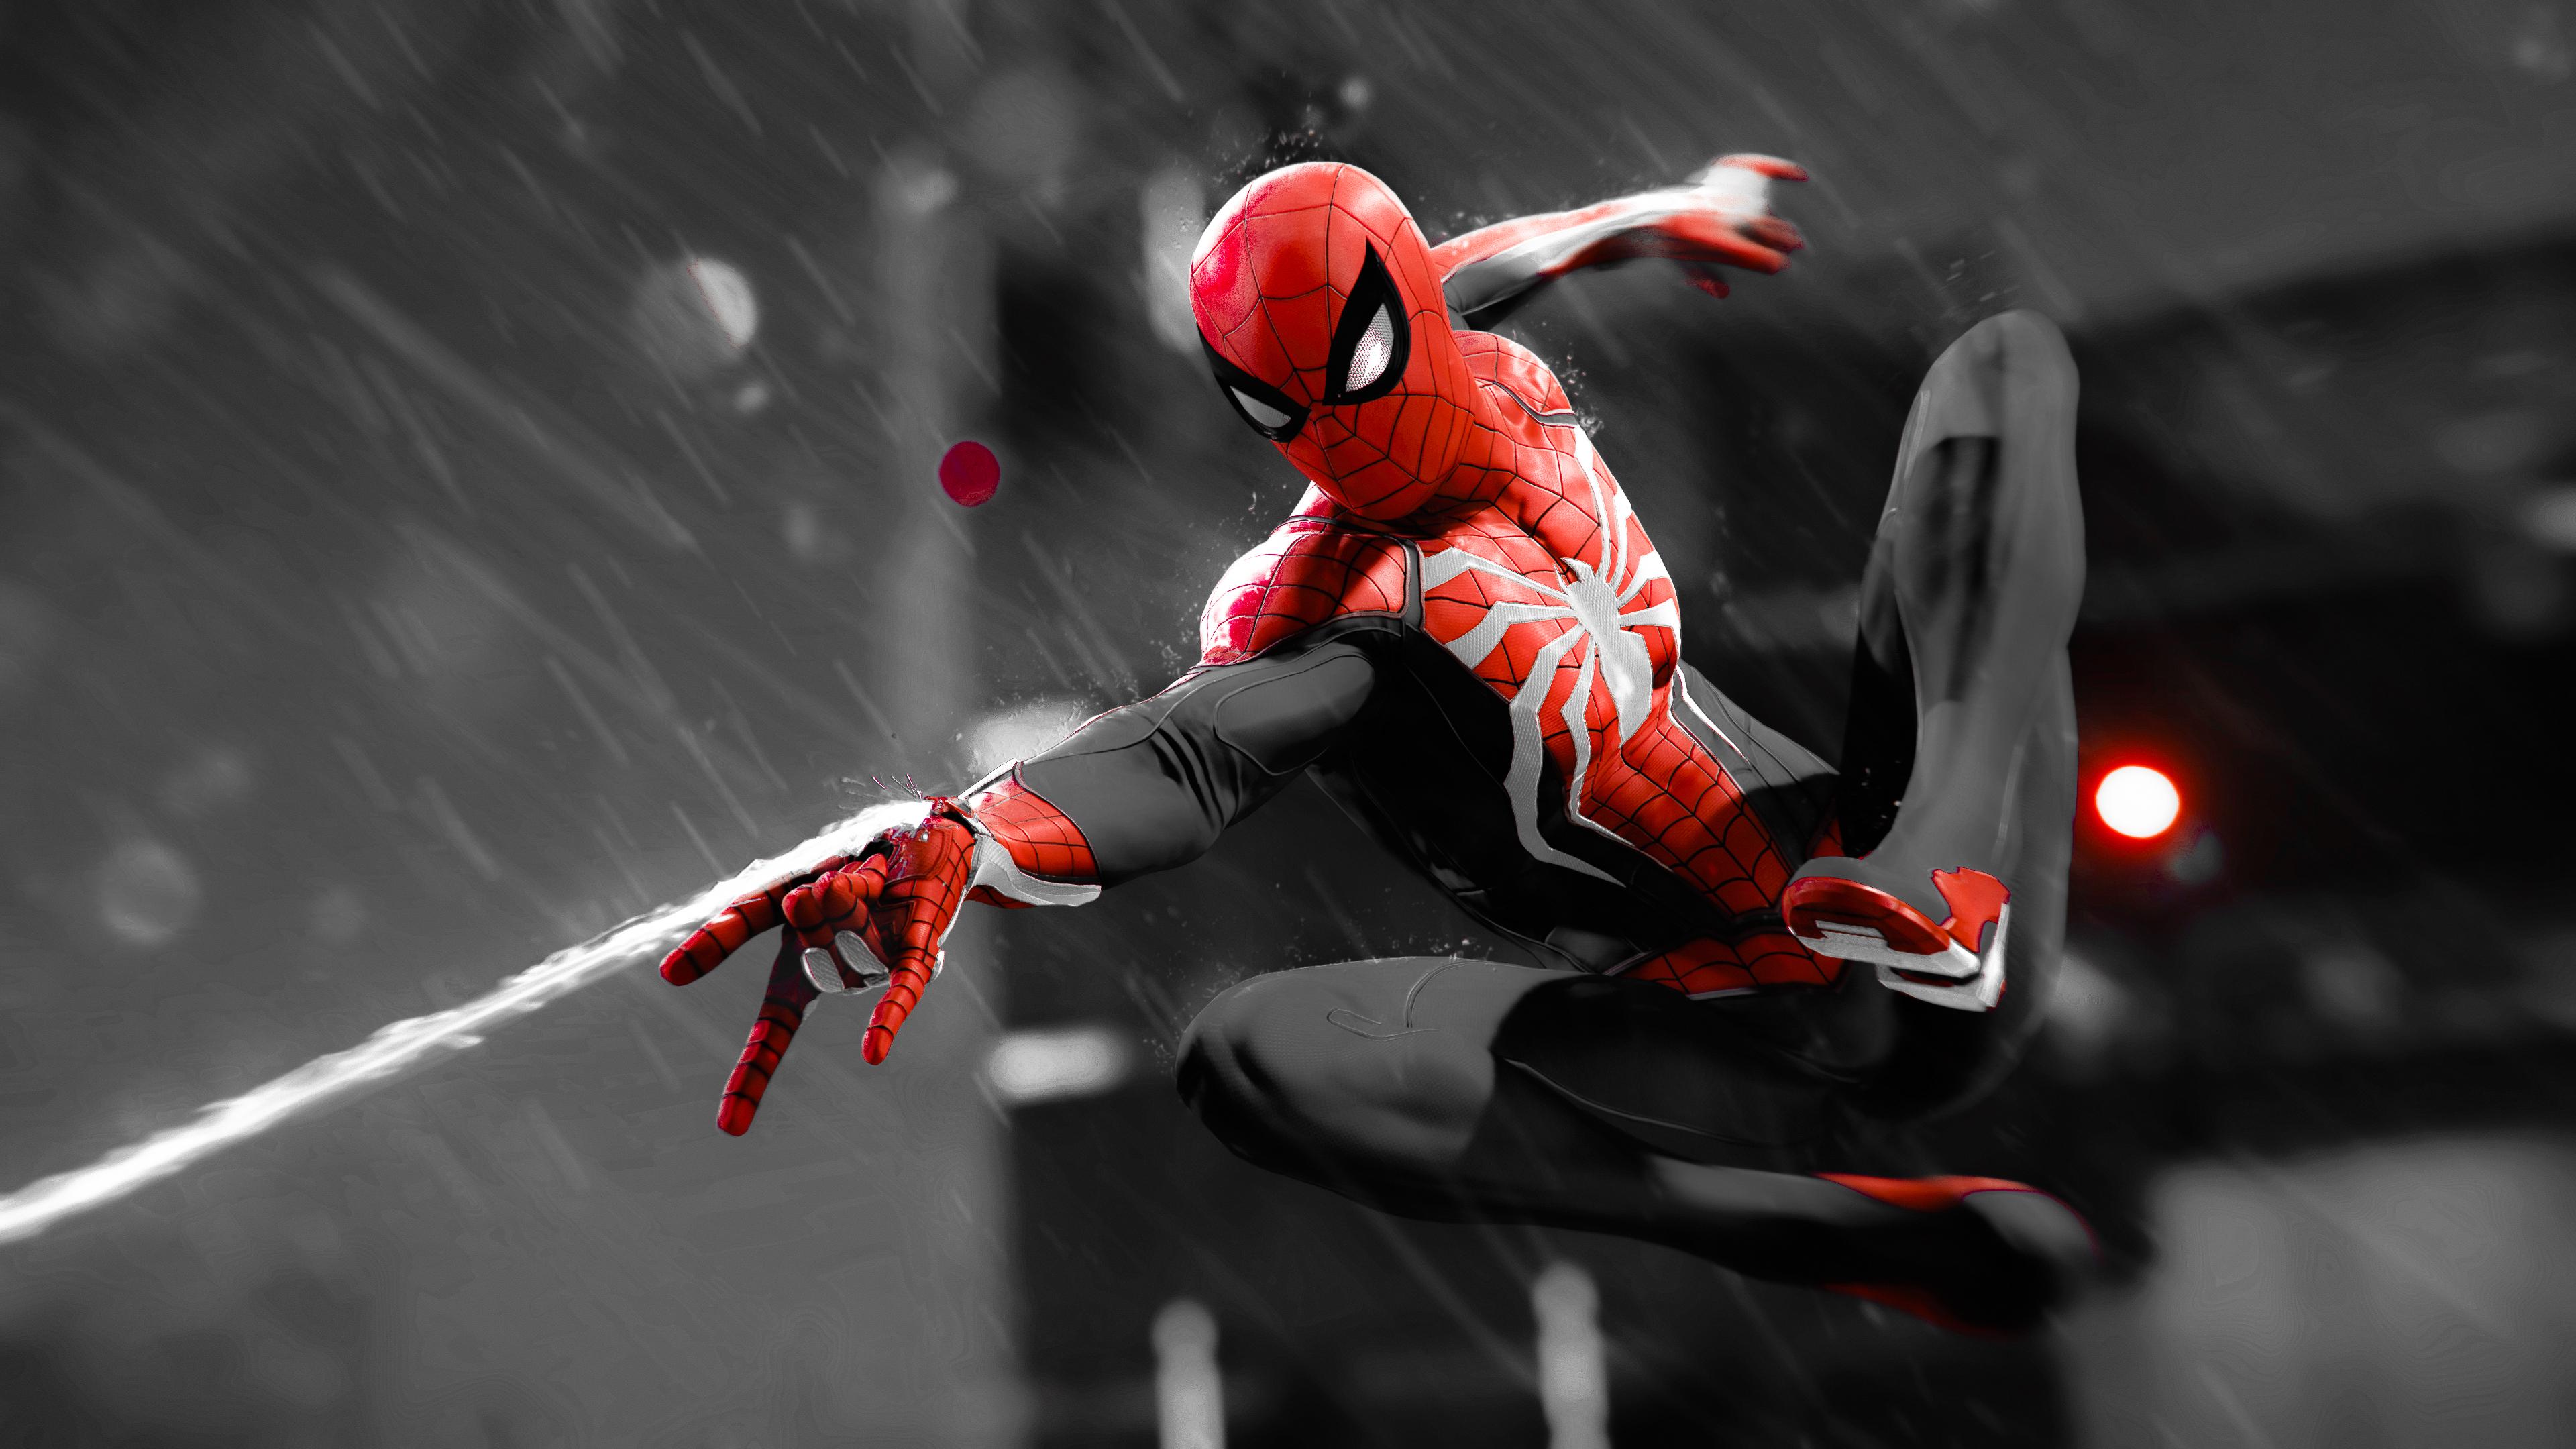 spiderman monochrome 4k 1544923157 - Spiderman Monochrome 4K - superheroes wallpapers, spiderman wallpapers, hd-wallpapers, digital art wallpapers, behance wallpapers, artwork wallpapers, 4k-wallpapers